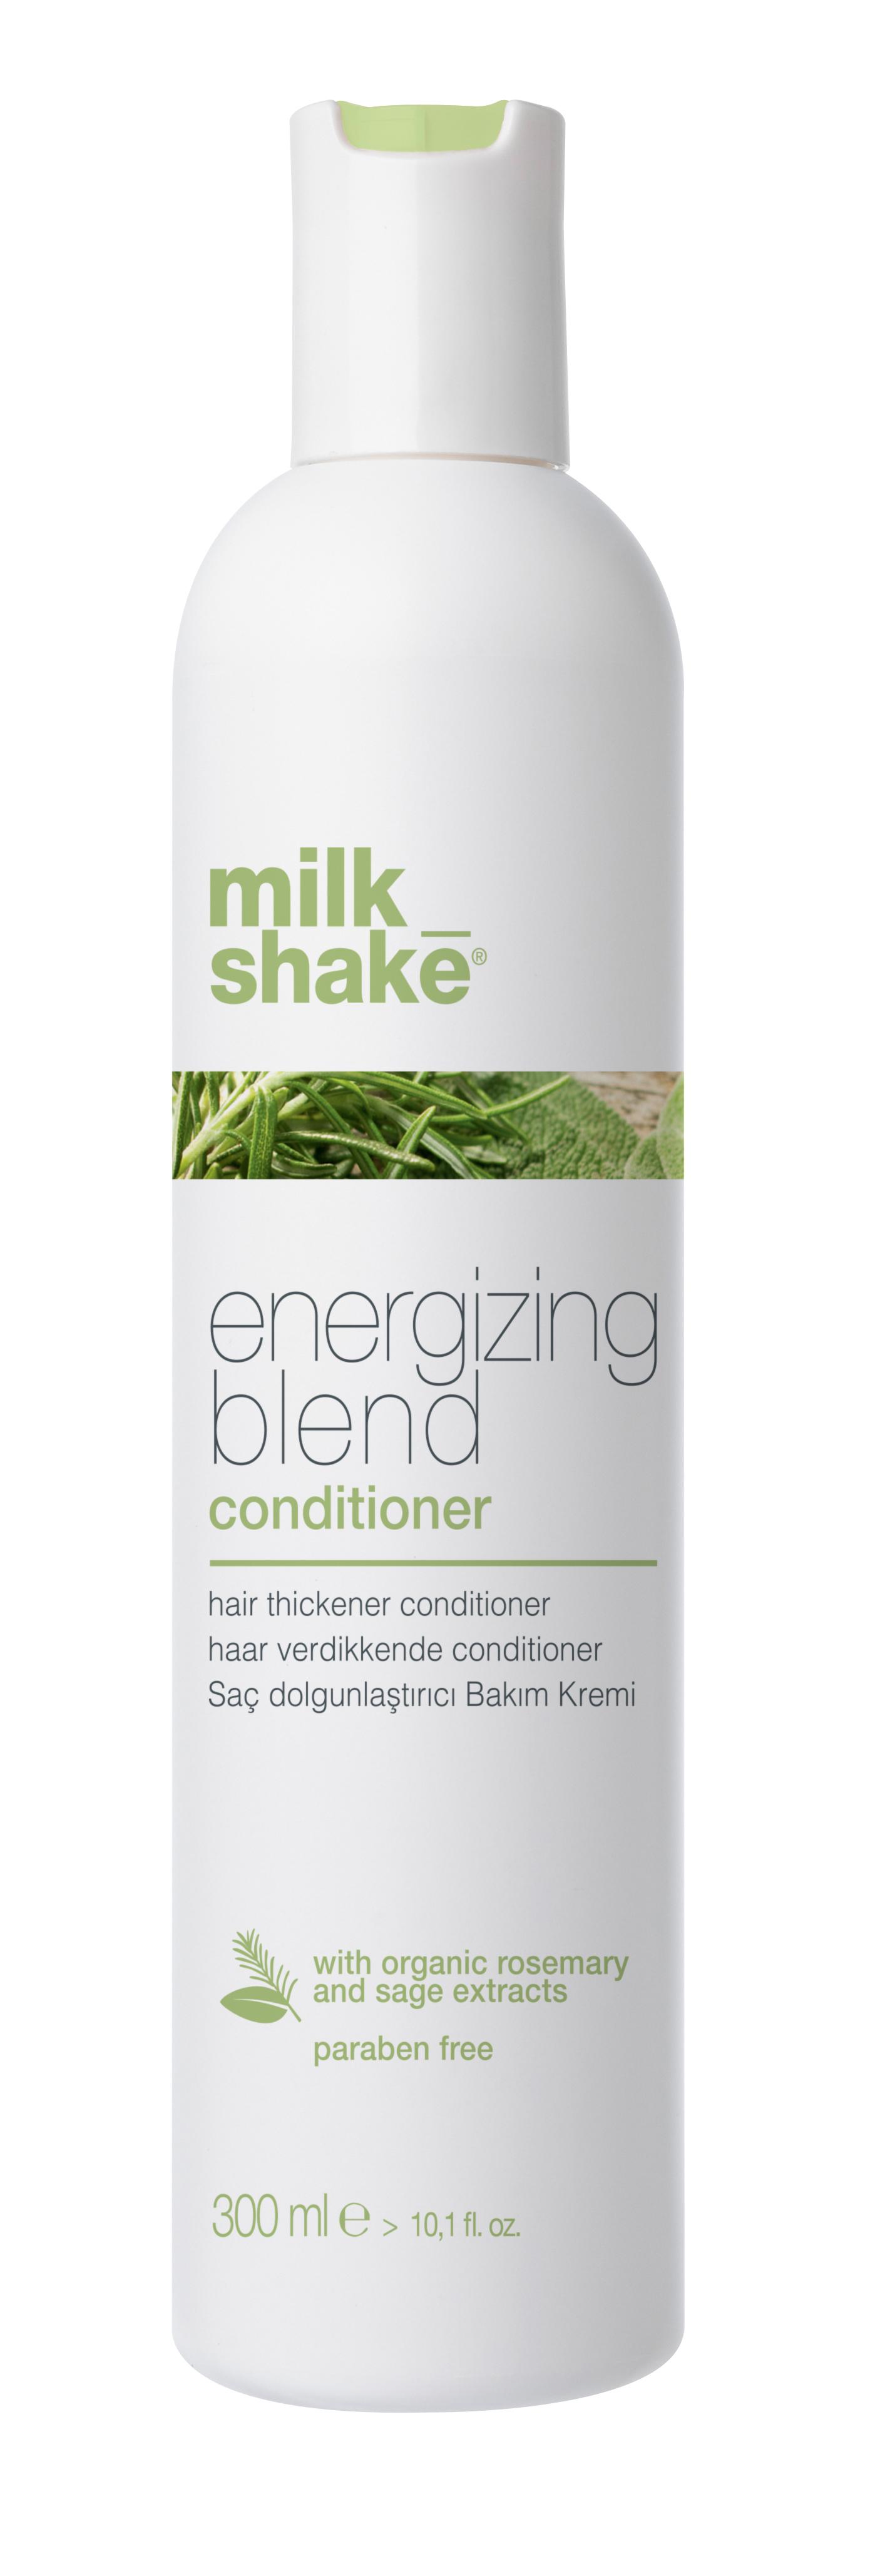 milk_shake - Energizing Blend Conditioner 300 ml